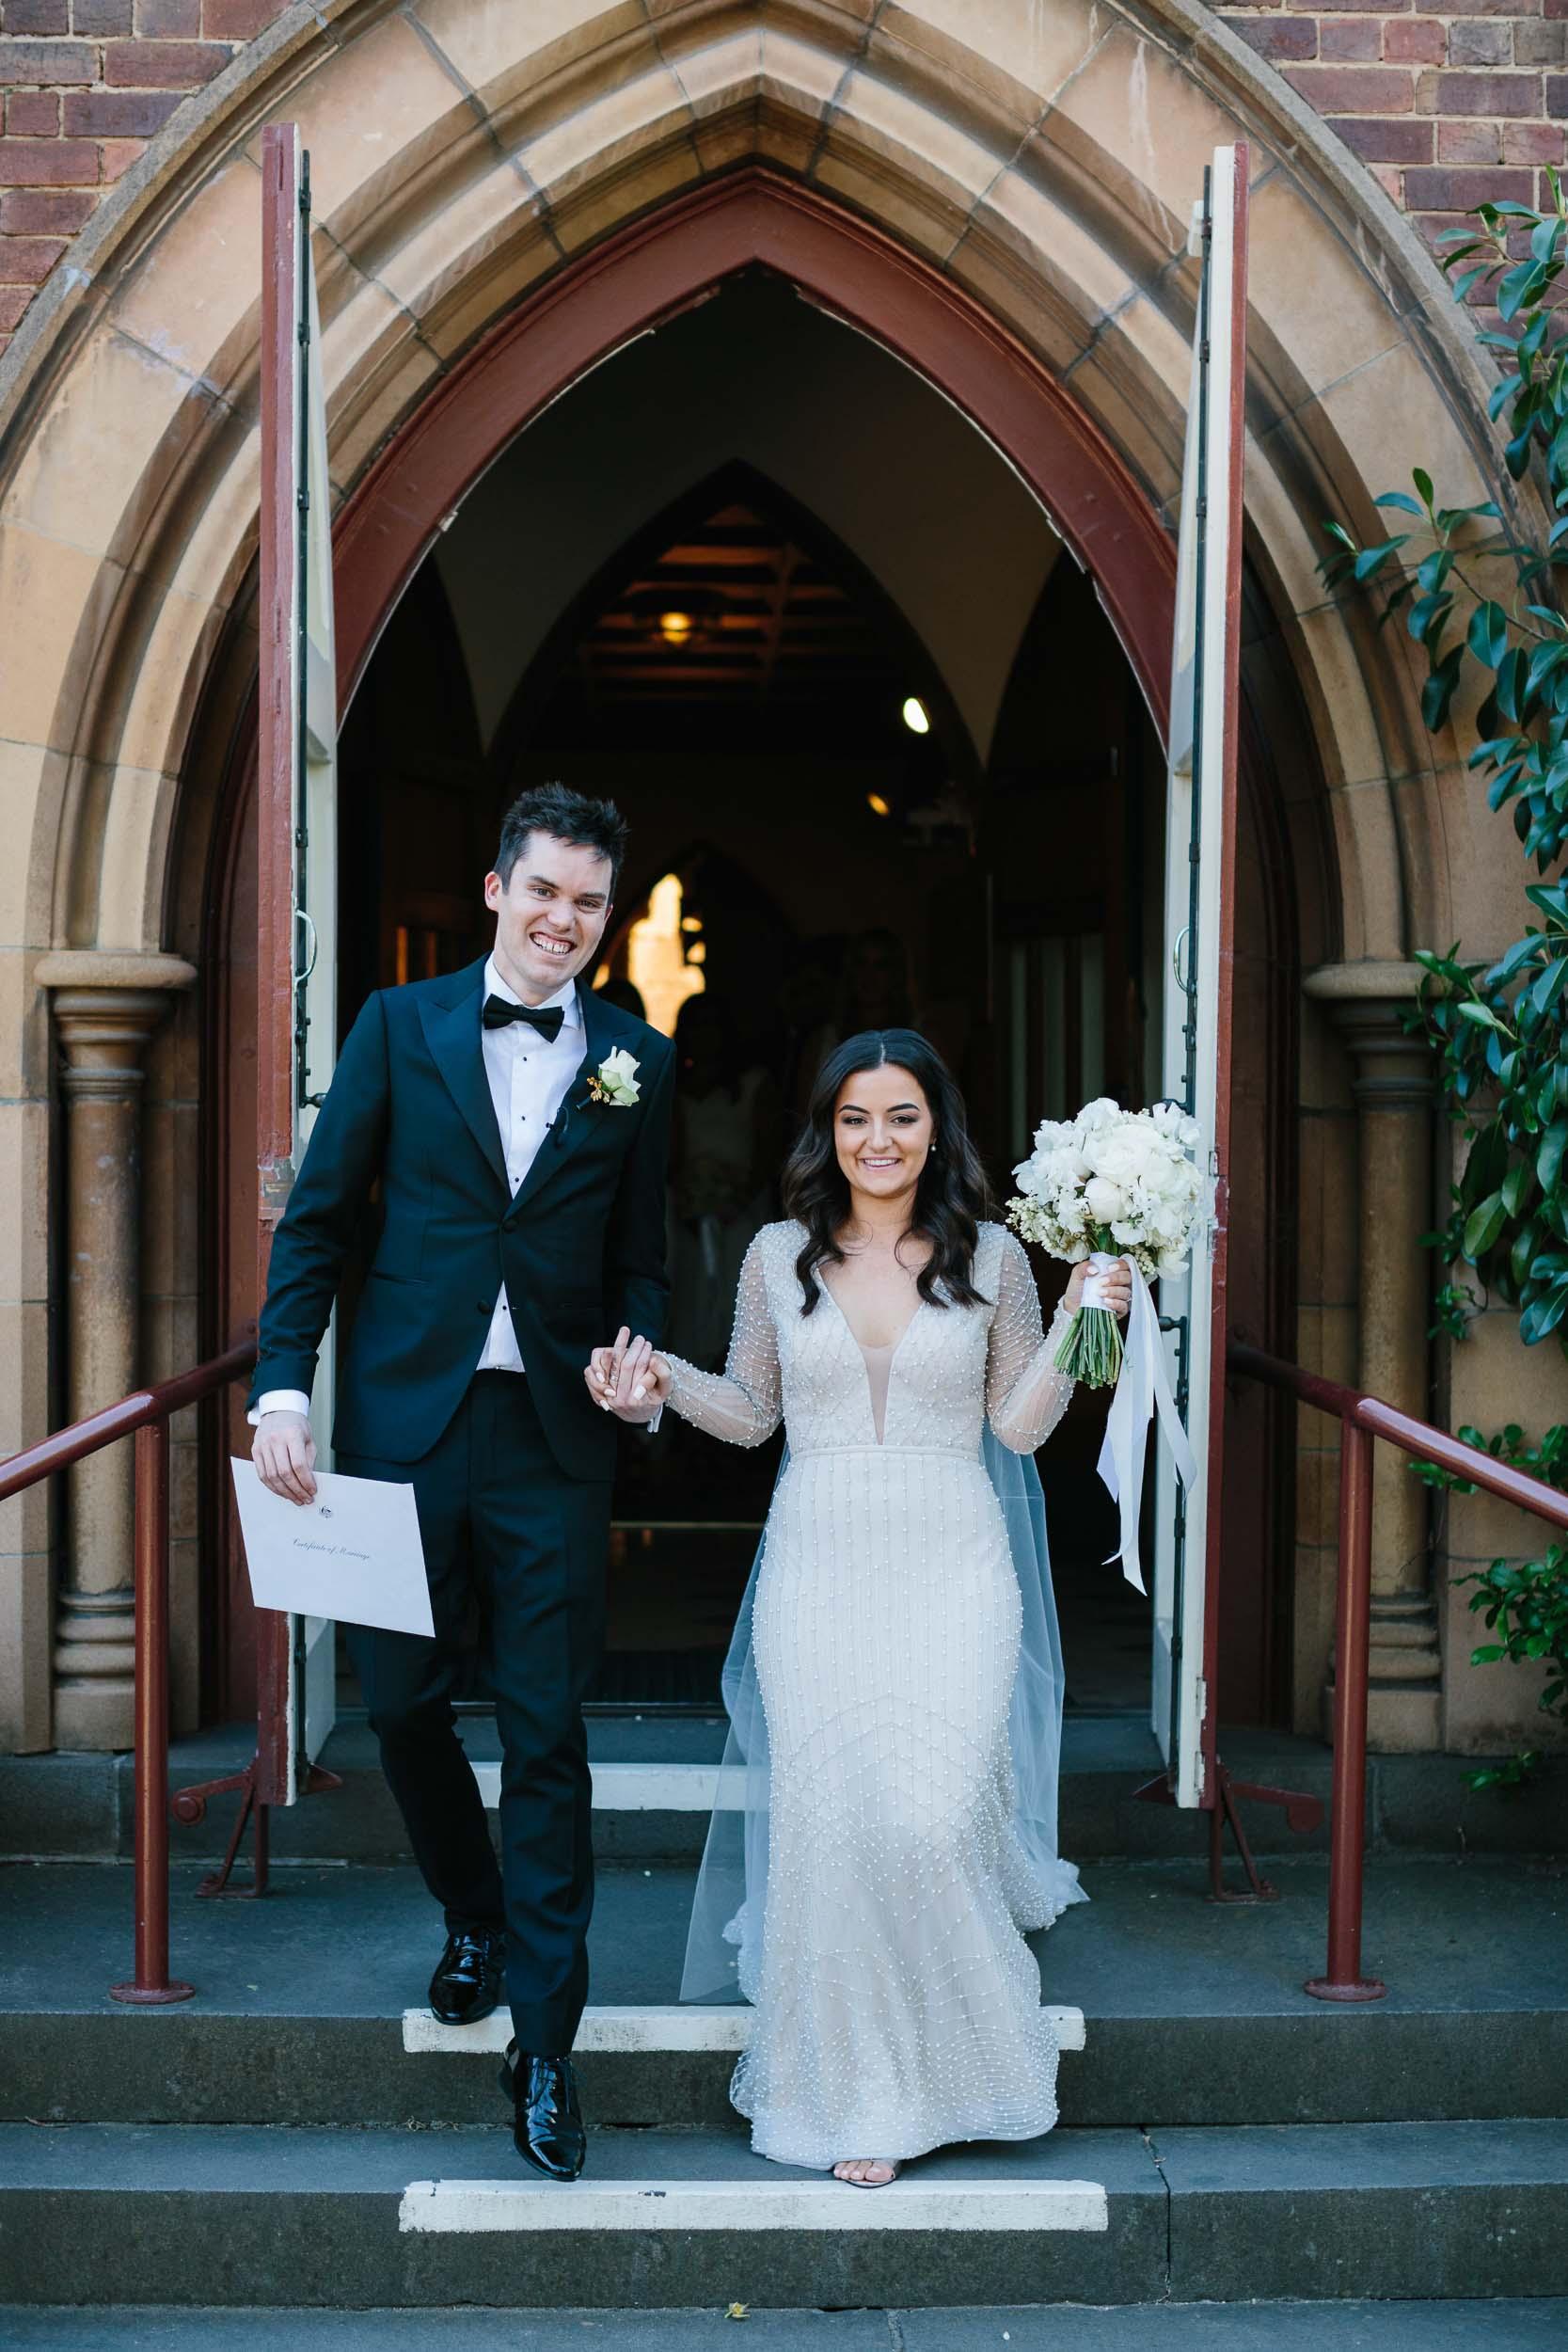 Kas-Richards-Wedding-Photographer-Melbourne-City-Wedding-Alto-Event-Space-Jane-Hill-Bridal-Gown-35.jpg